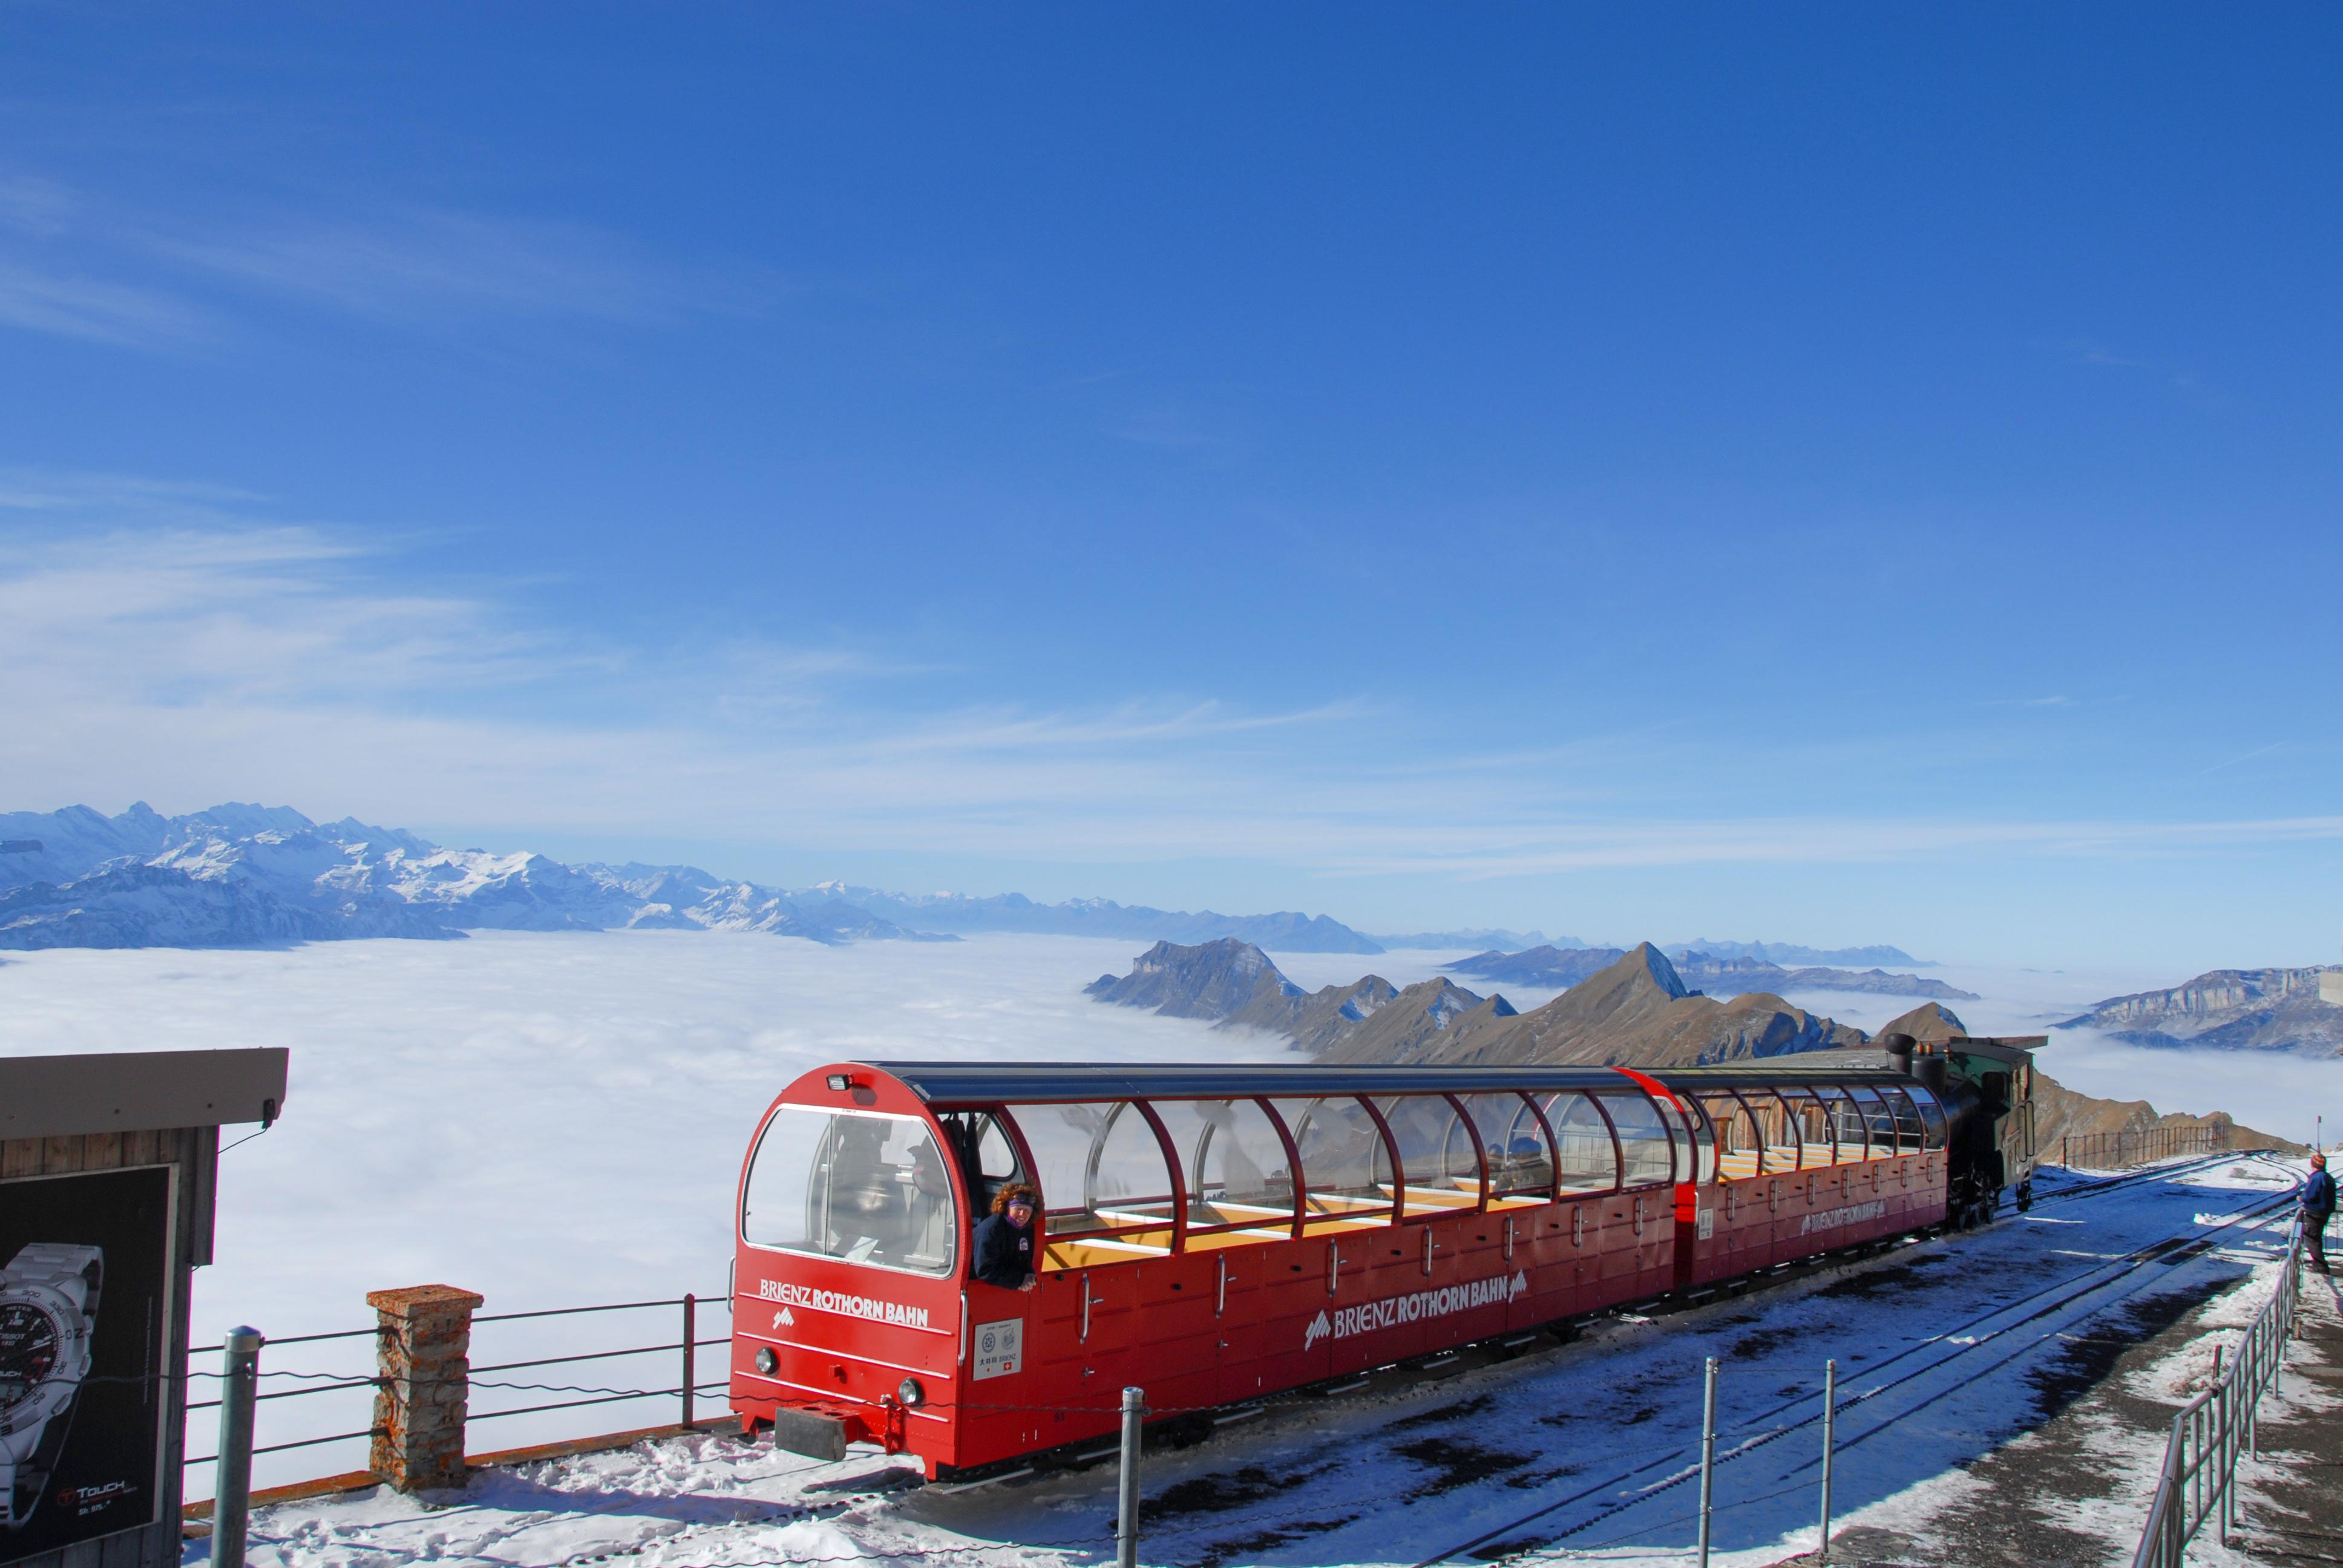 Brienz Rothorn Railway with snow